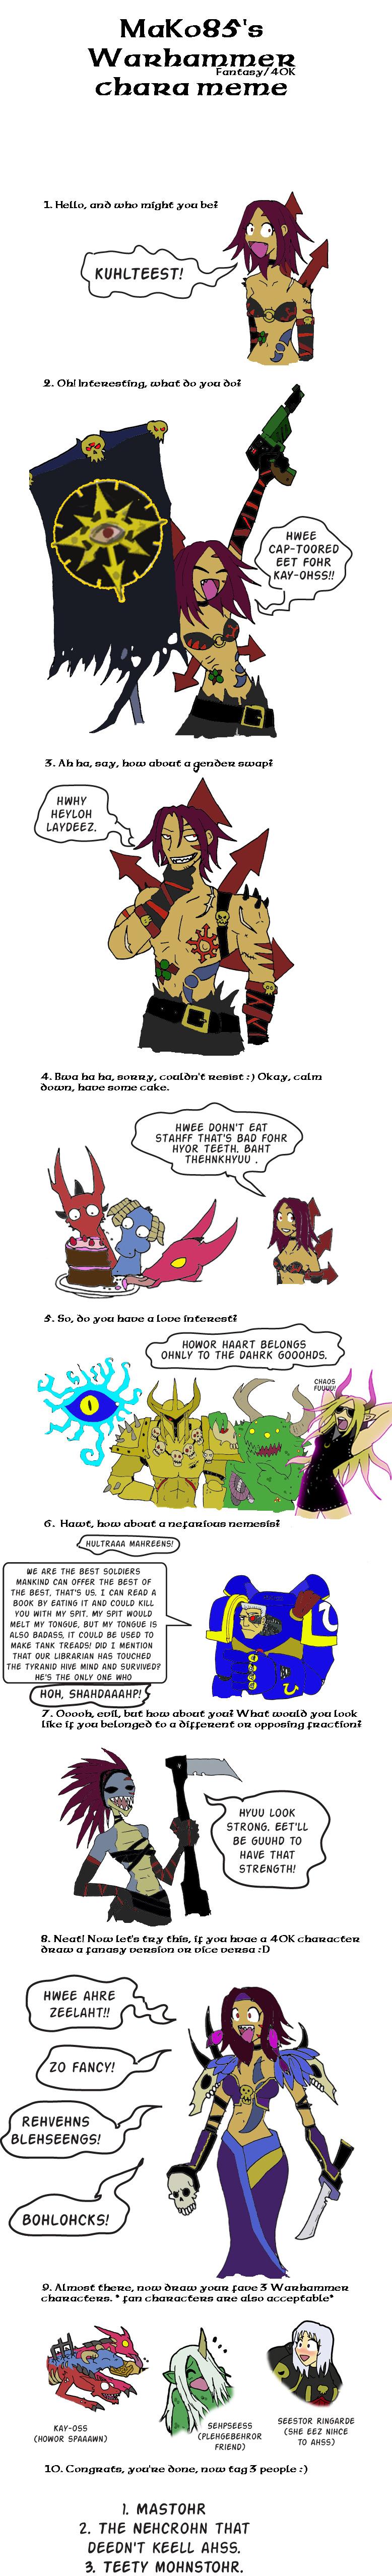 Funny 40K - Pagina 5 Makos_Art_meme__Cultist_by_Mr_Culexus